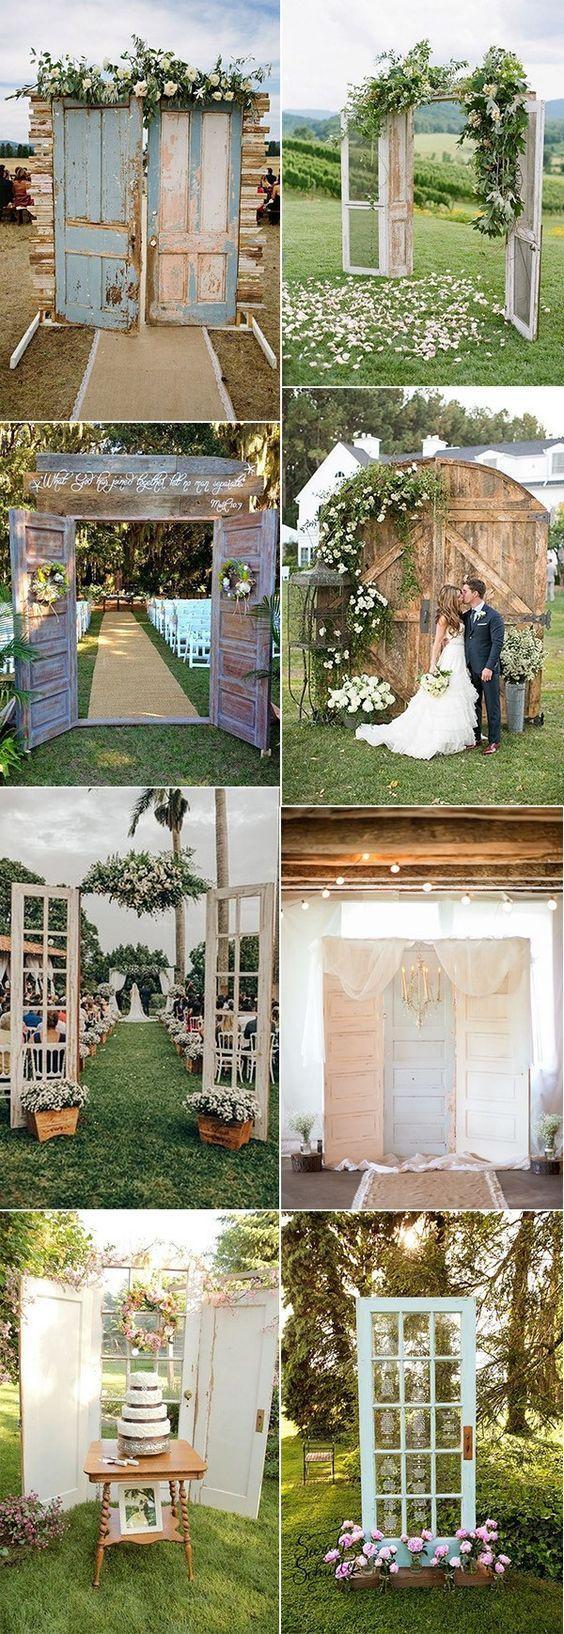 100 Rustic Wedding Ideas Diy Country Outdoor Wedding Arches Spring Weddings Fall Weddings